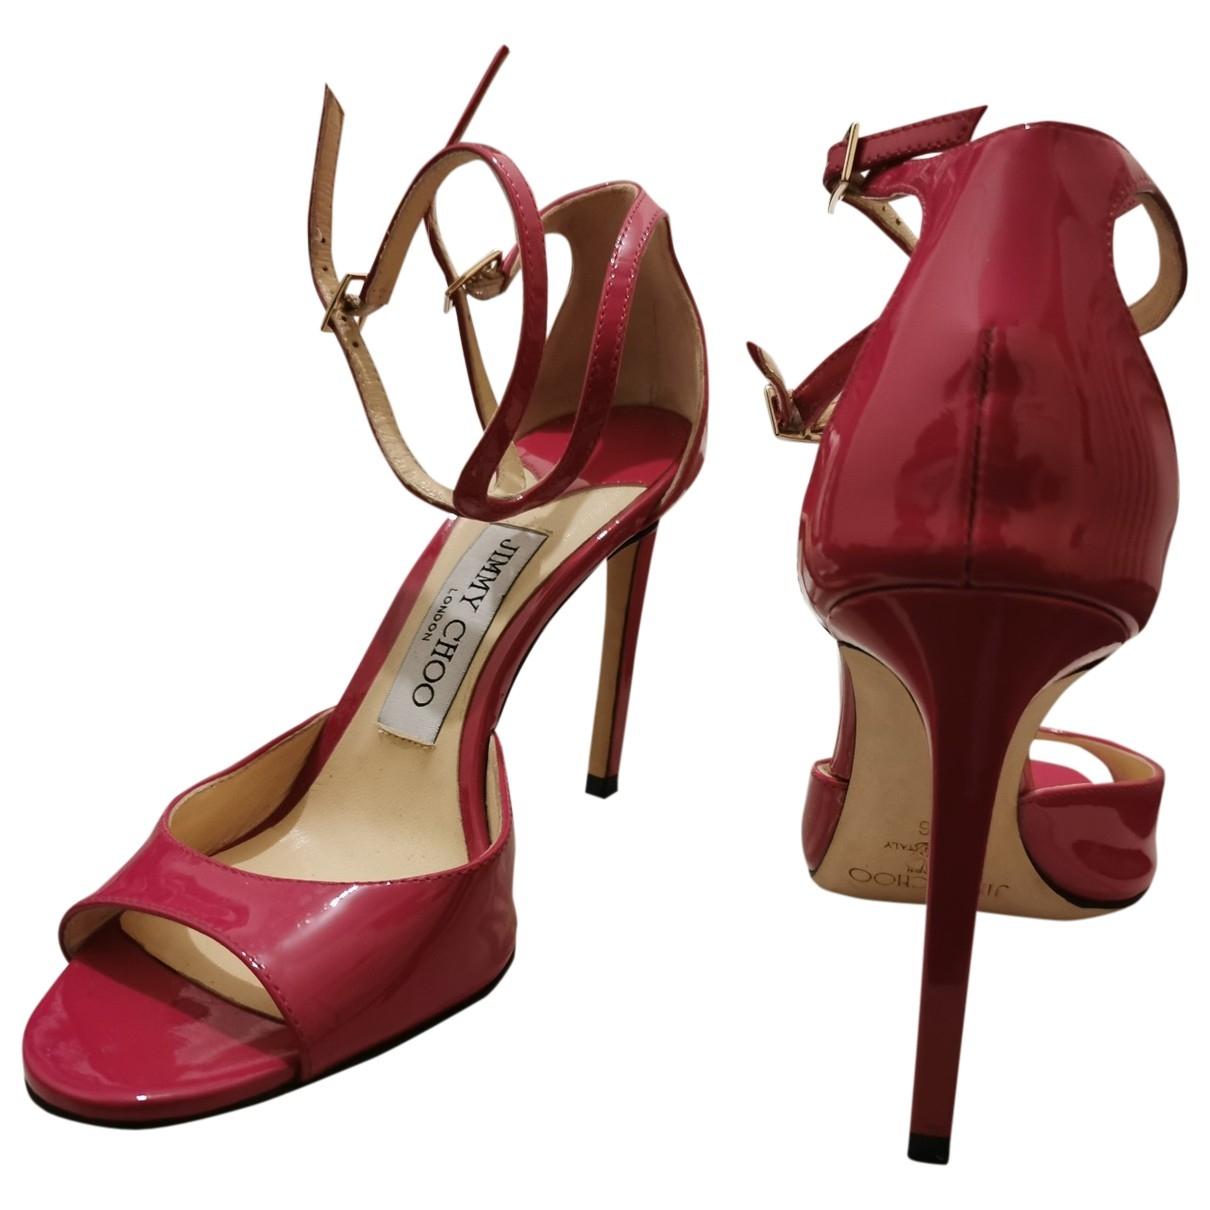 Jimmy Choo \N Patent leather Sandals for Women 36 EU